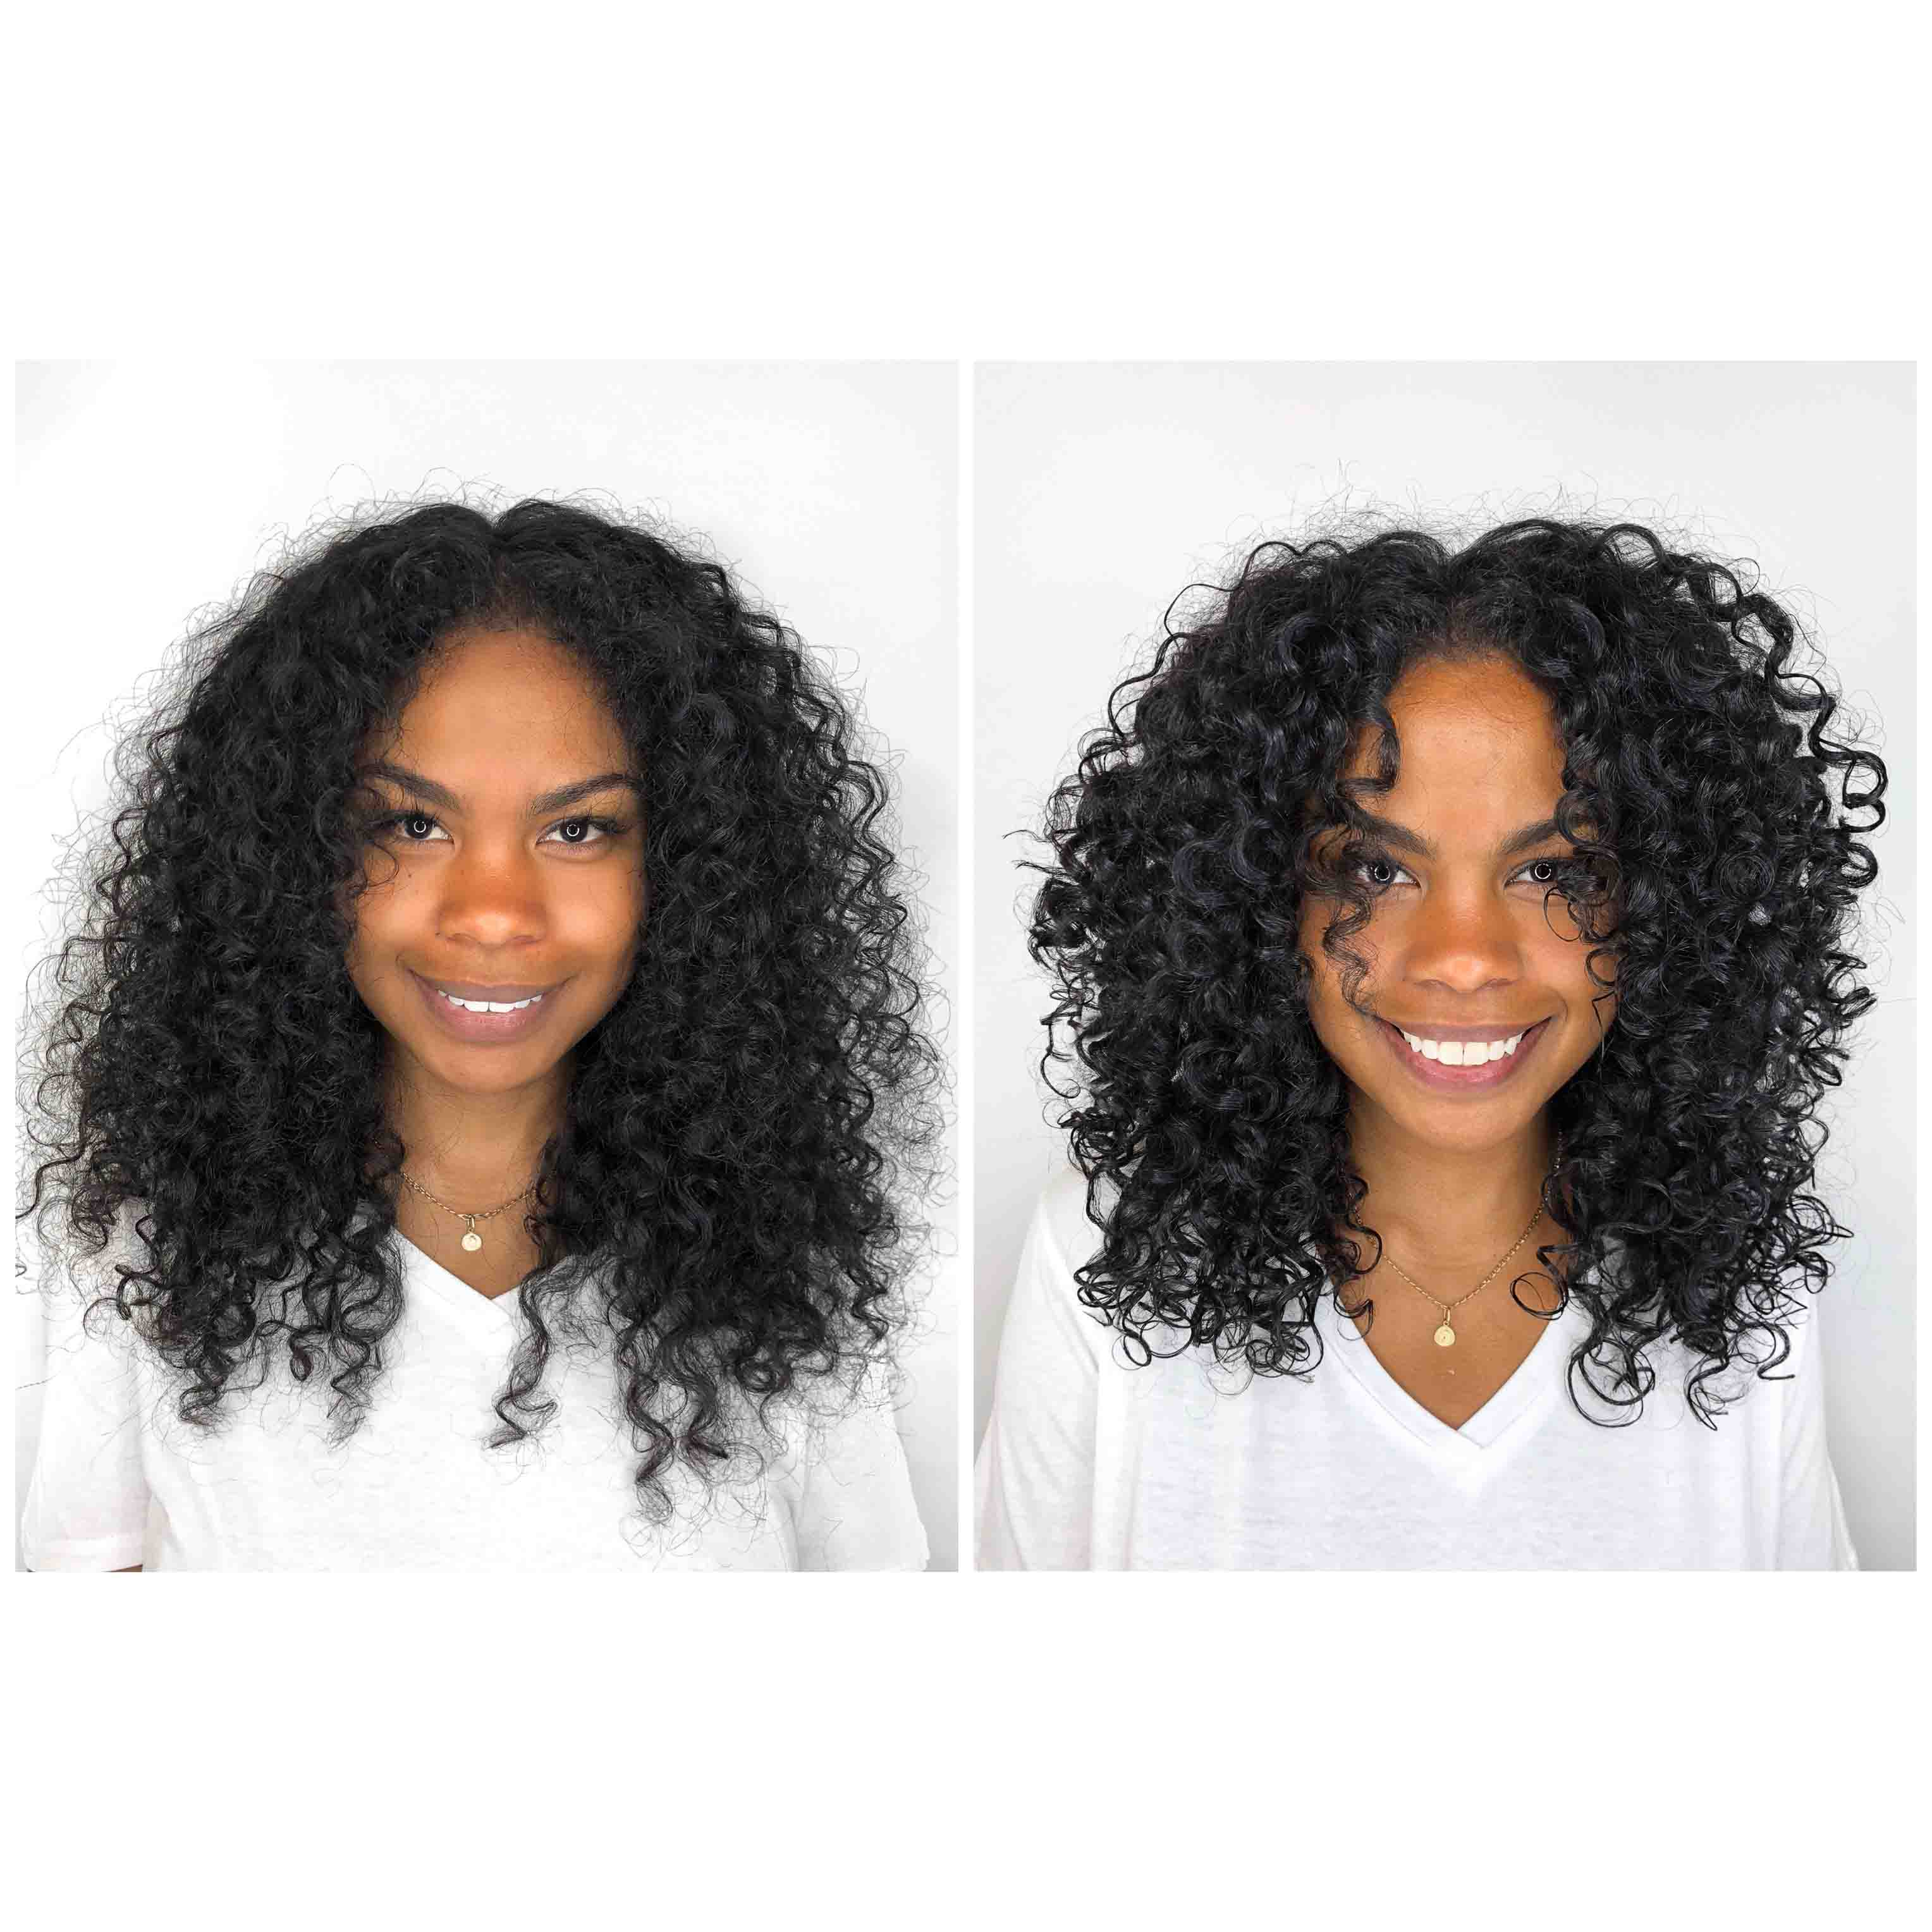 Curly hair salon San Diego  The Daze Studio  United States